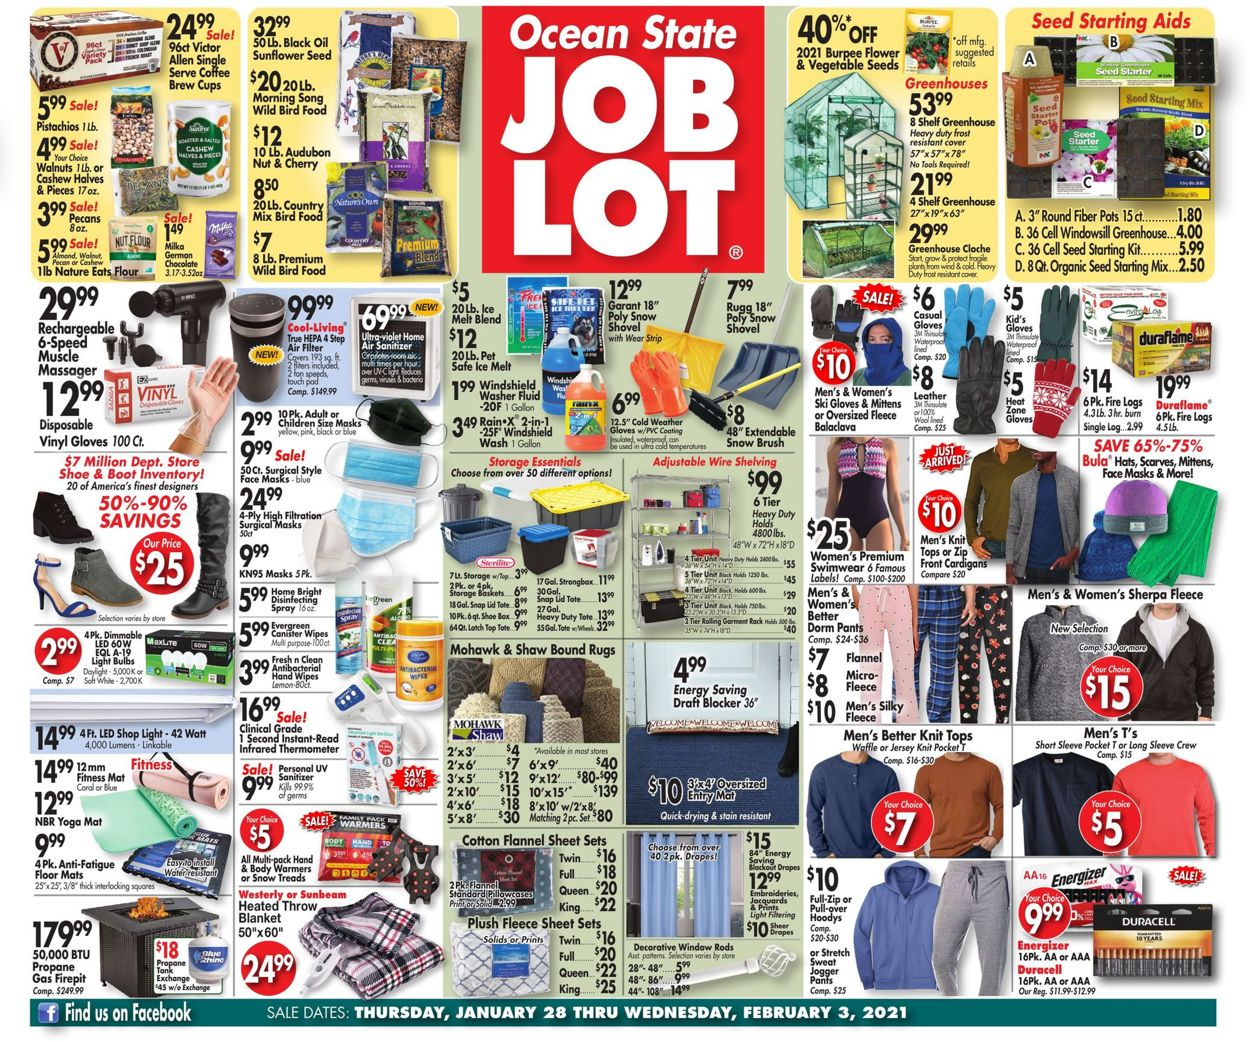 Ocean State Job Lot Weekly Ad Circular - valid 01/28-02/03/2021